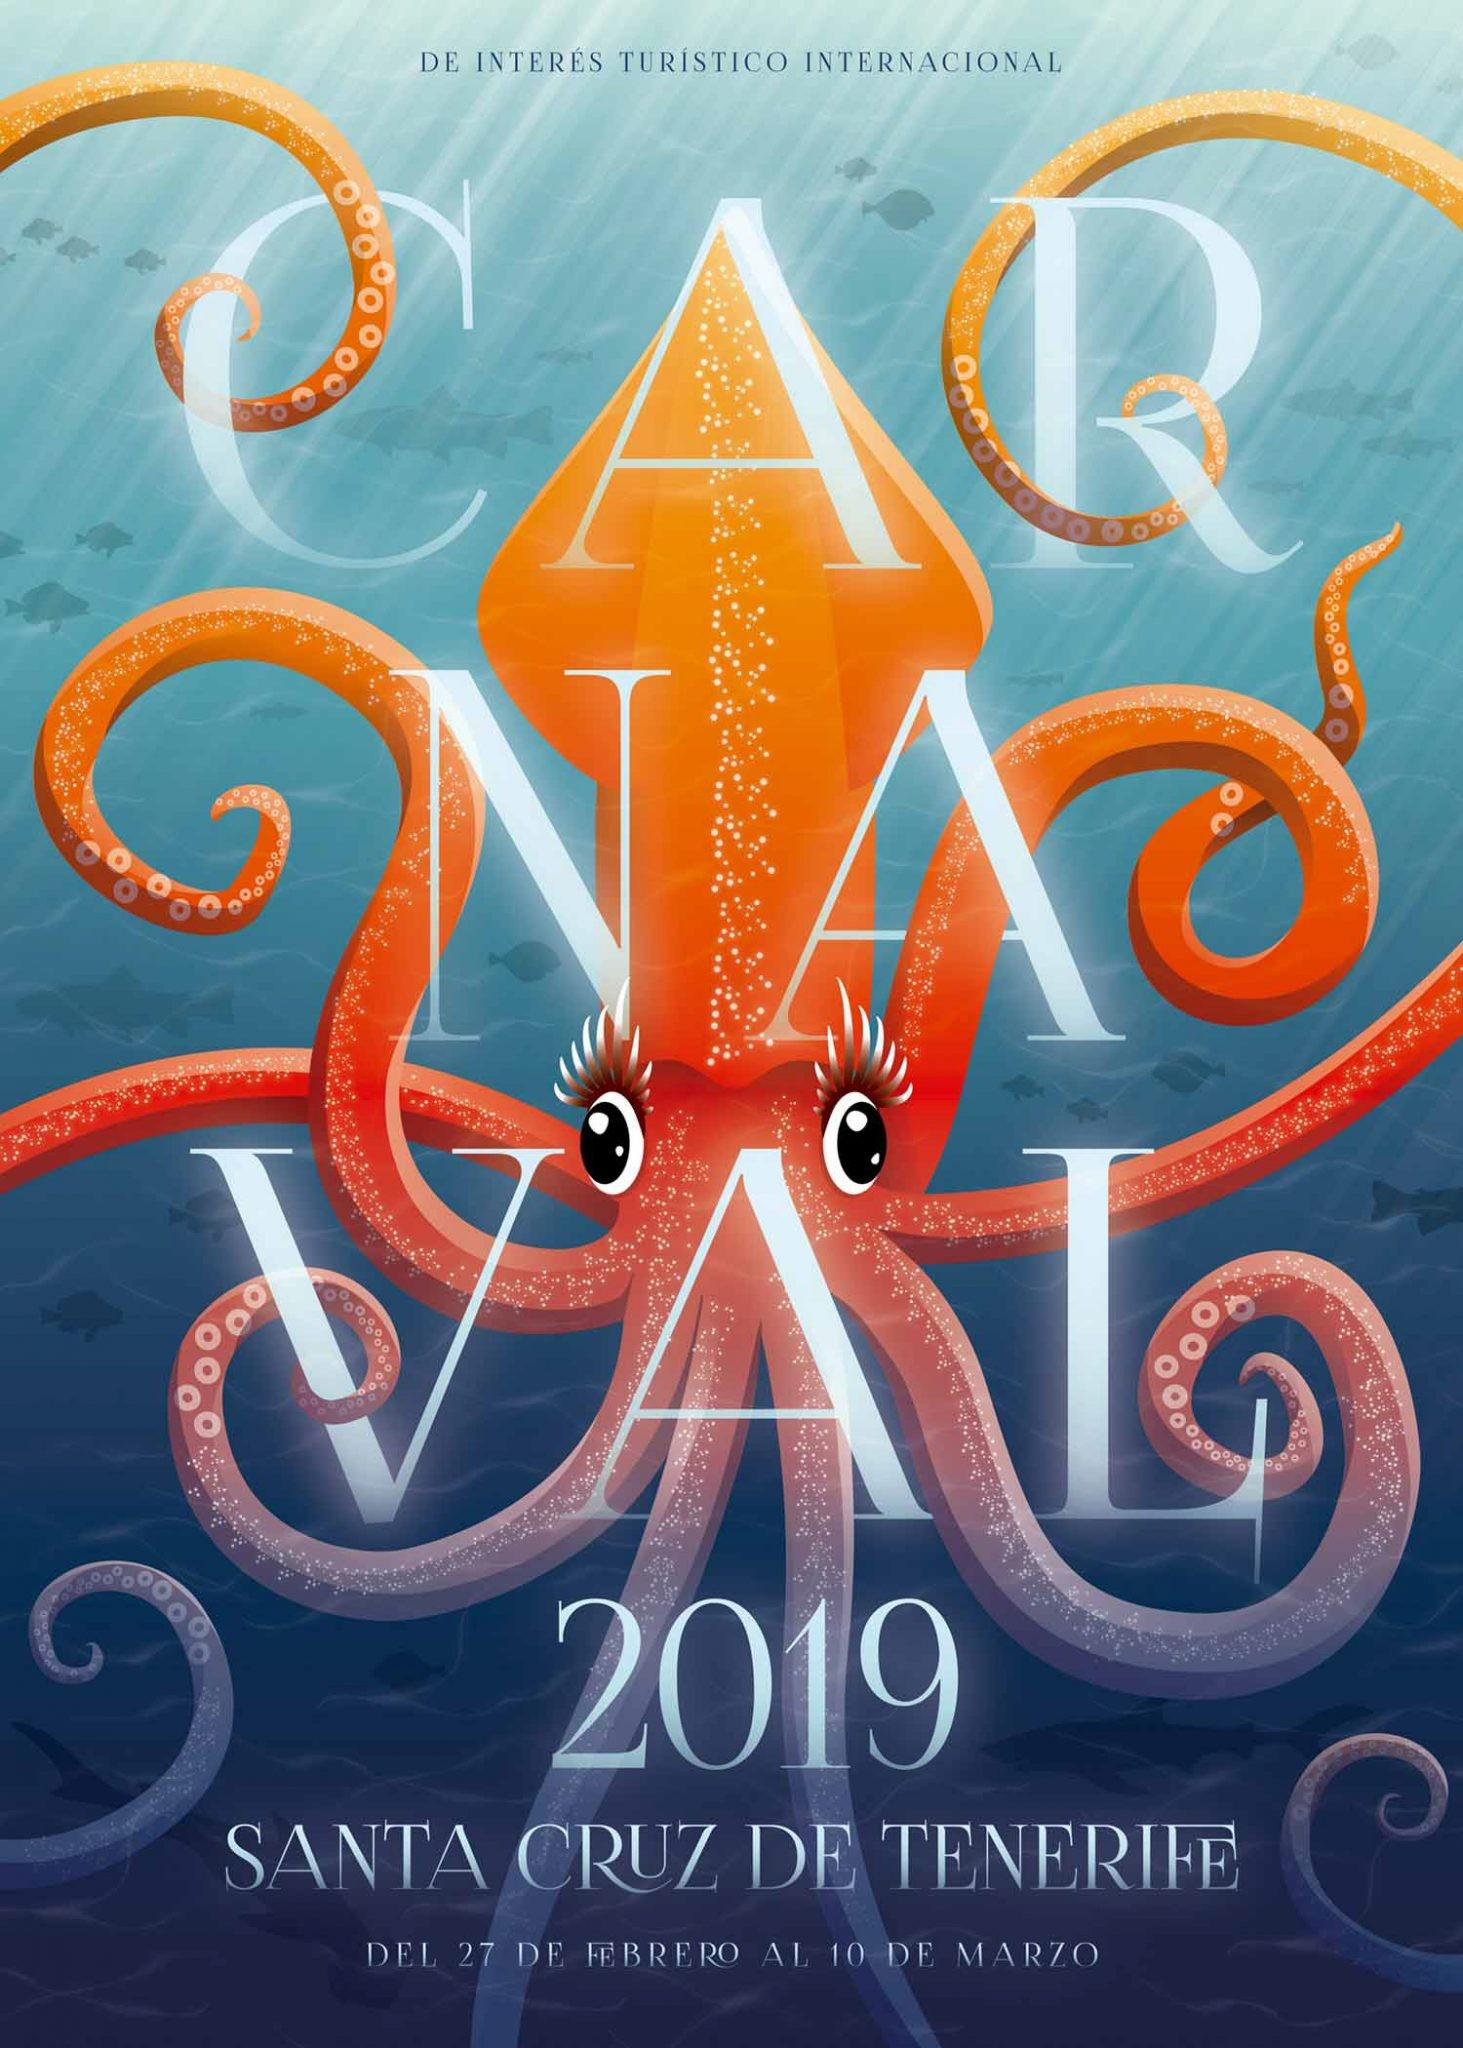 ¡Que viene el Kraken 437